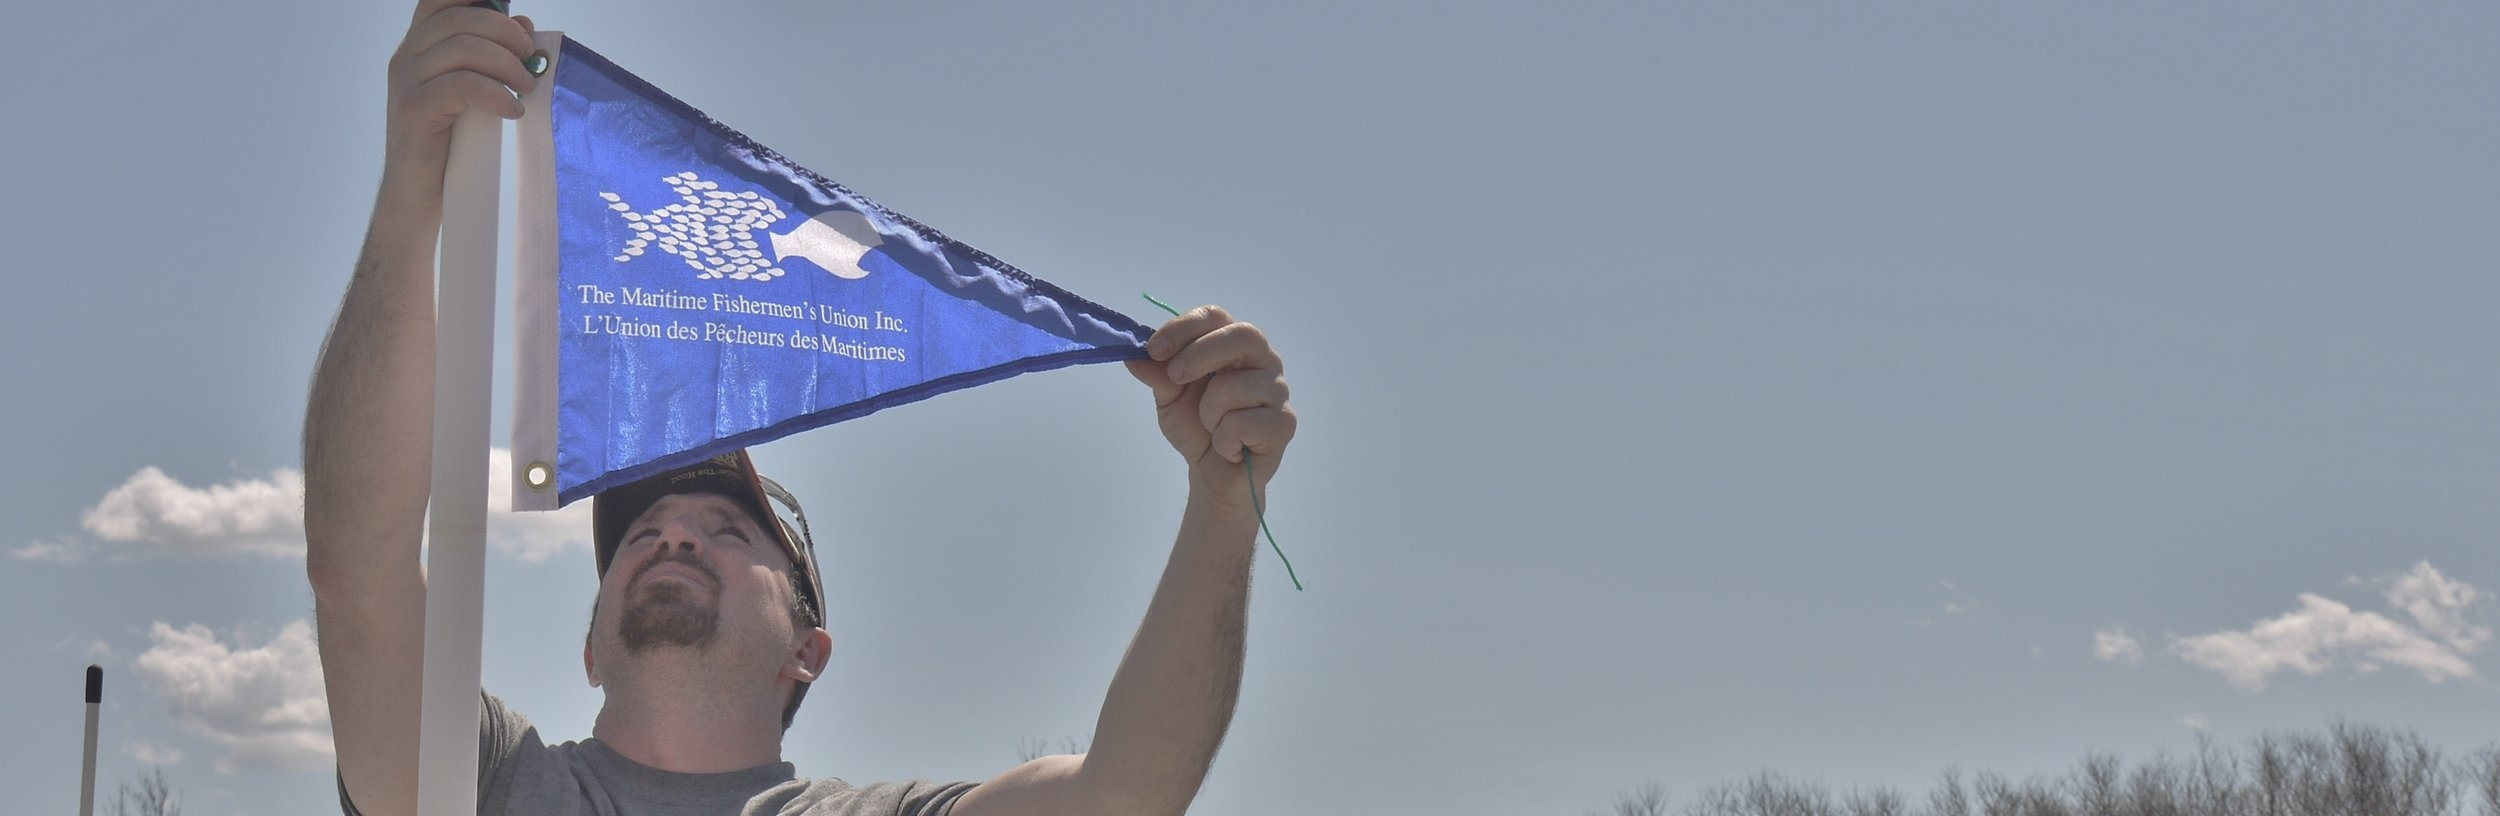 drapeau upm.JPG